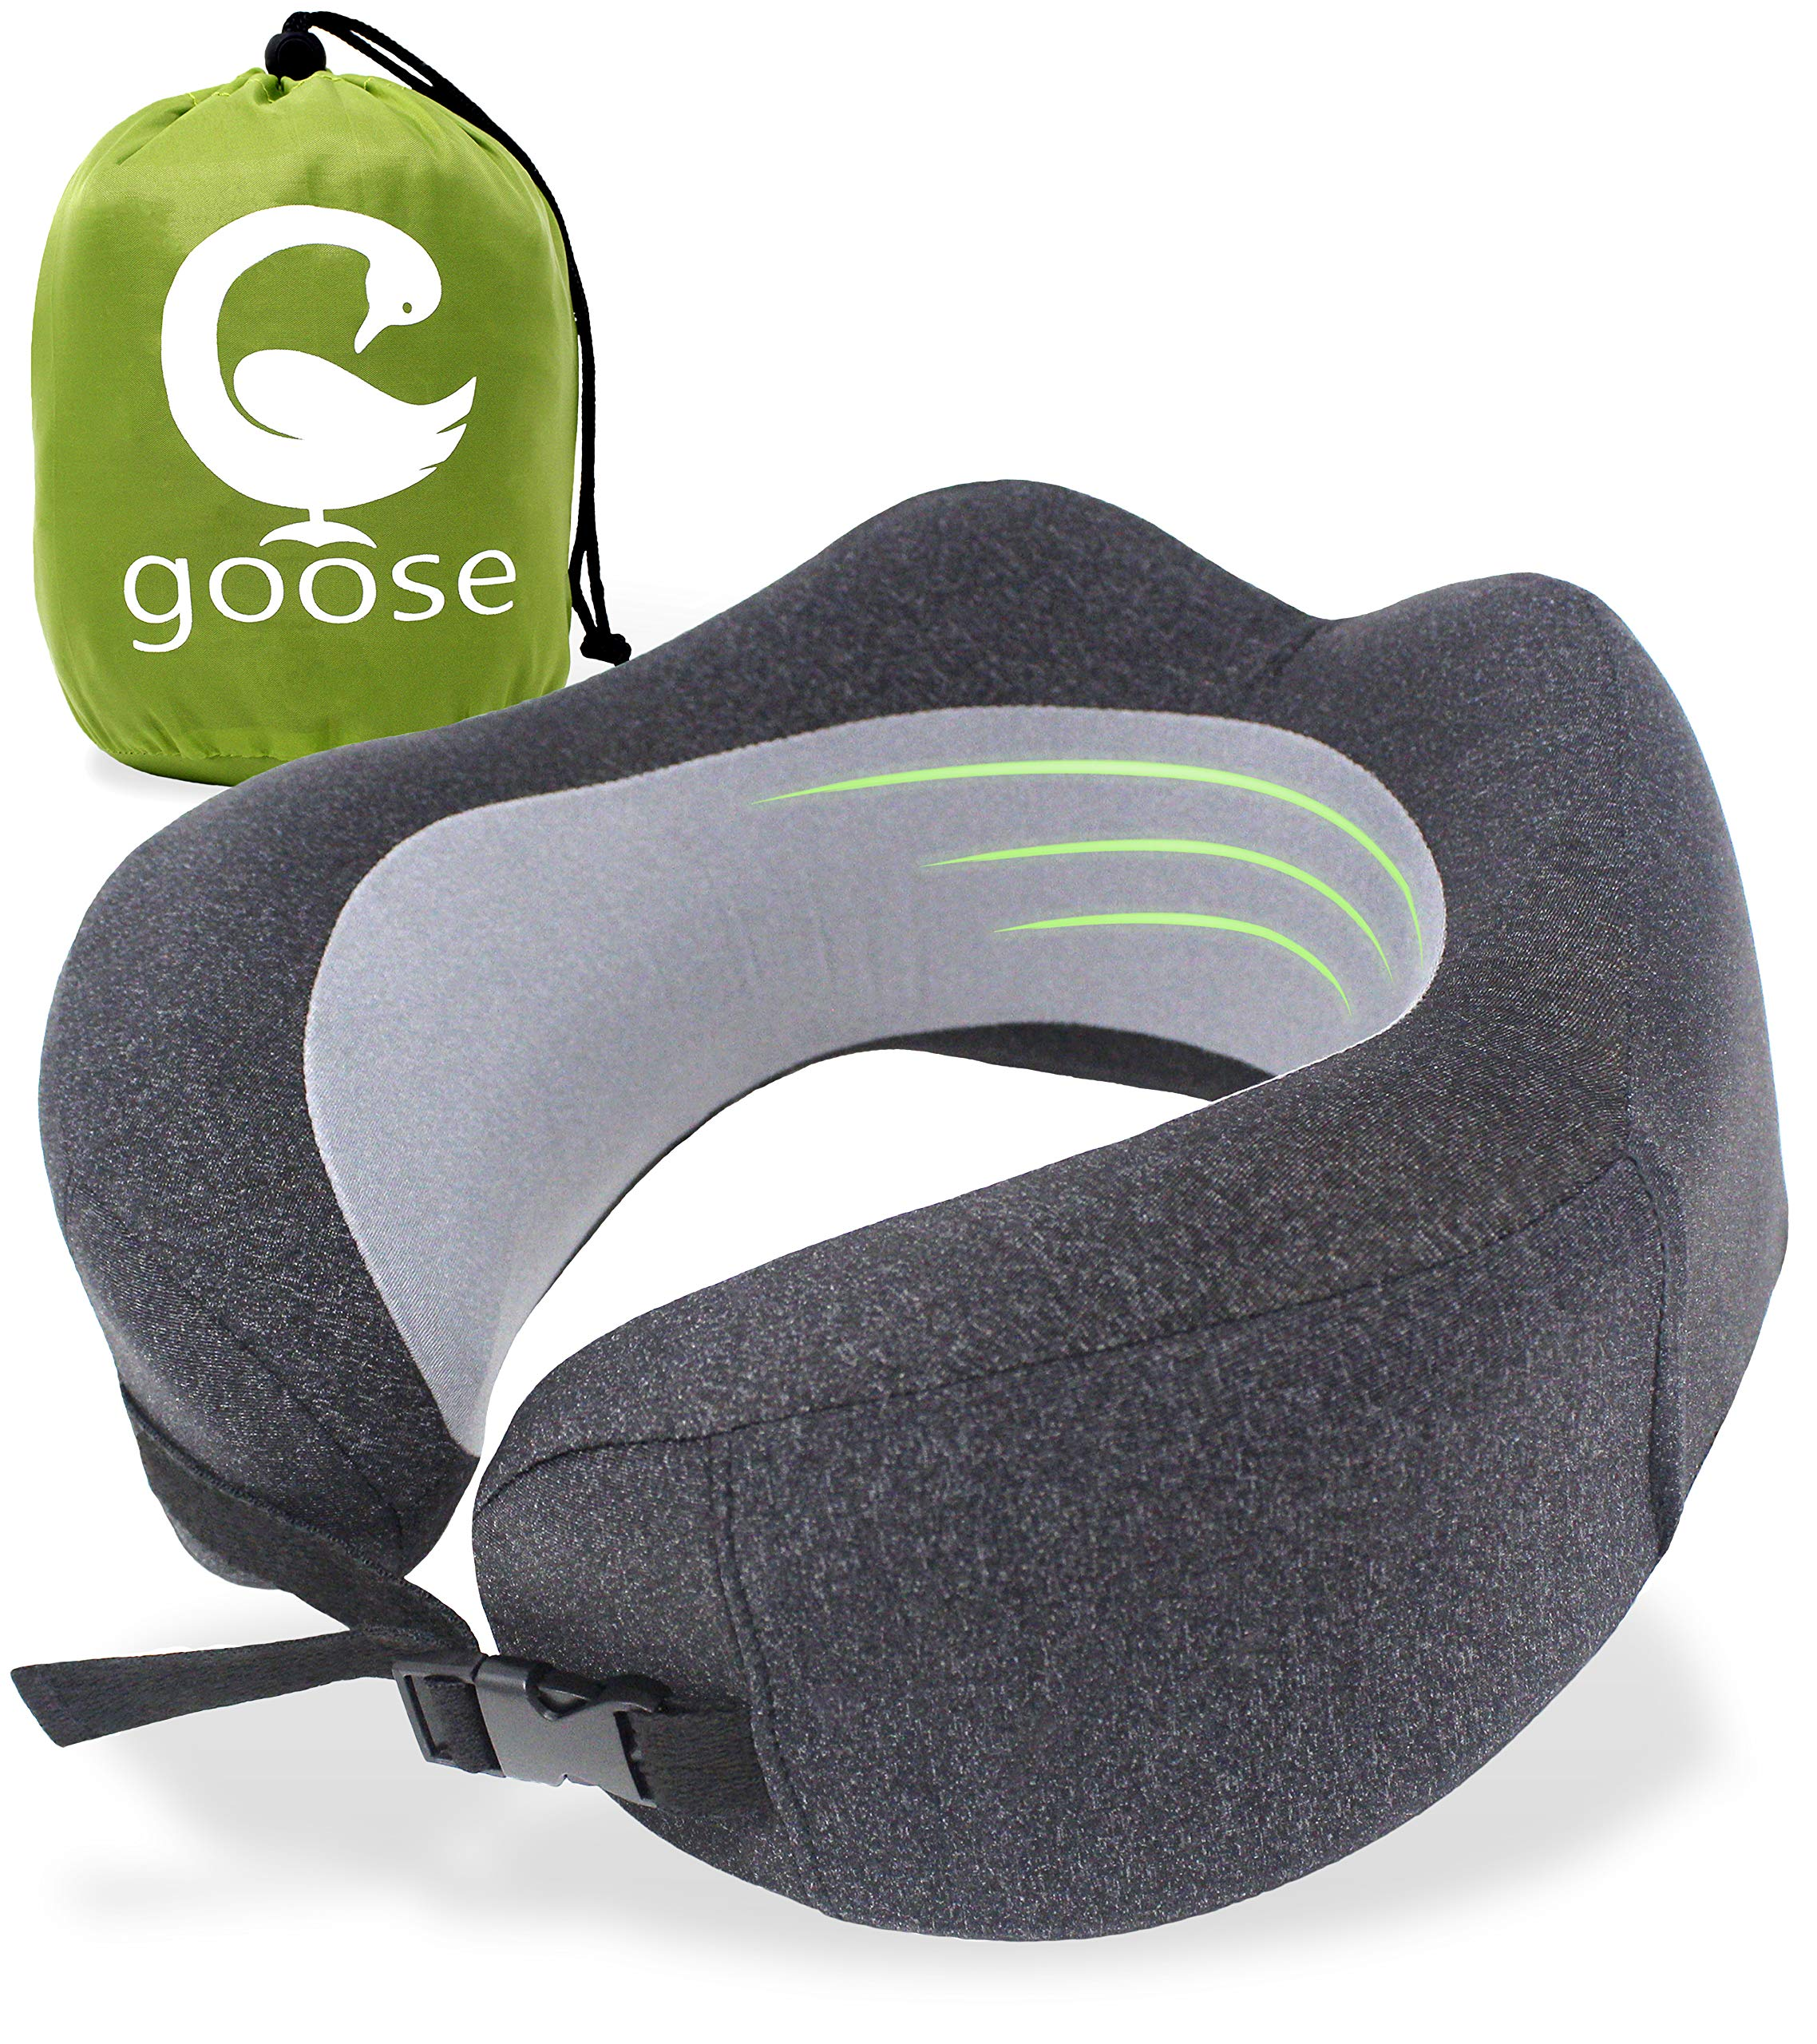 Goose Memory Travel Airplane Sleeping